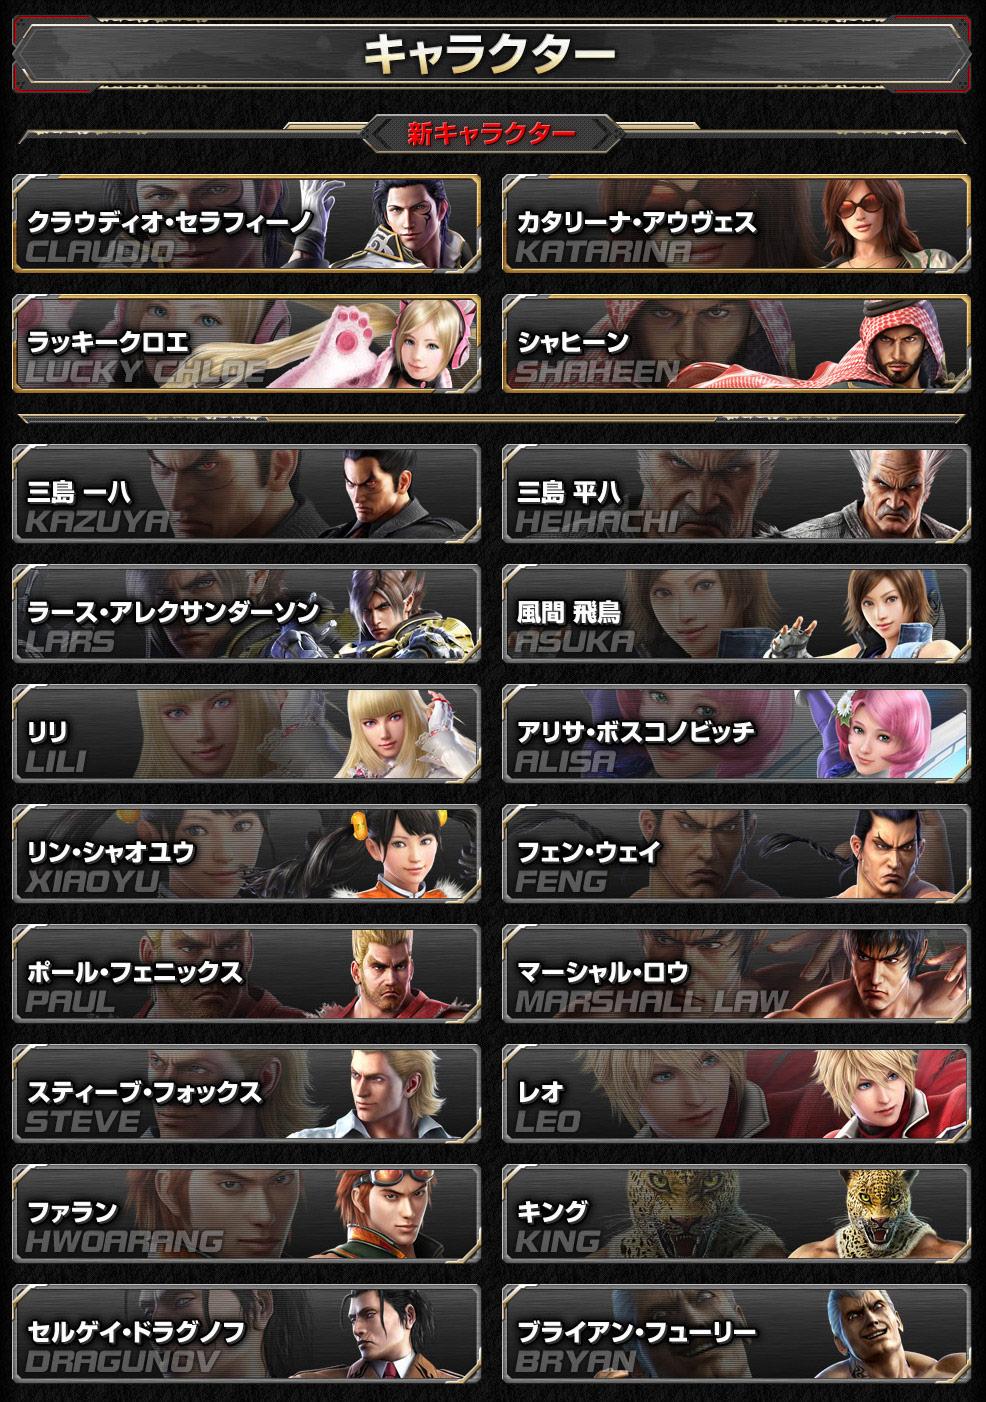 Tekken 7 Arcade Character List